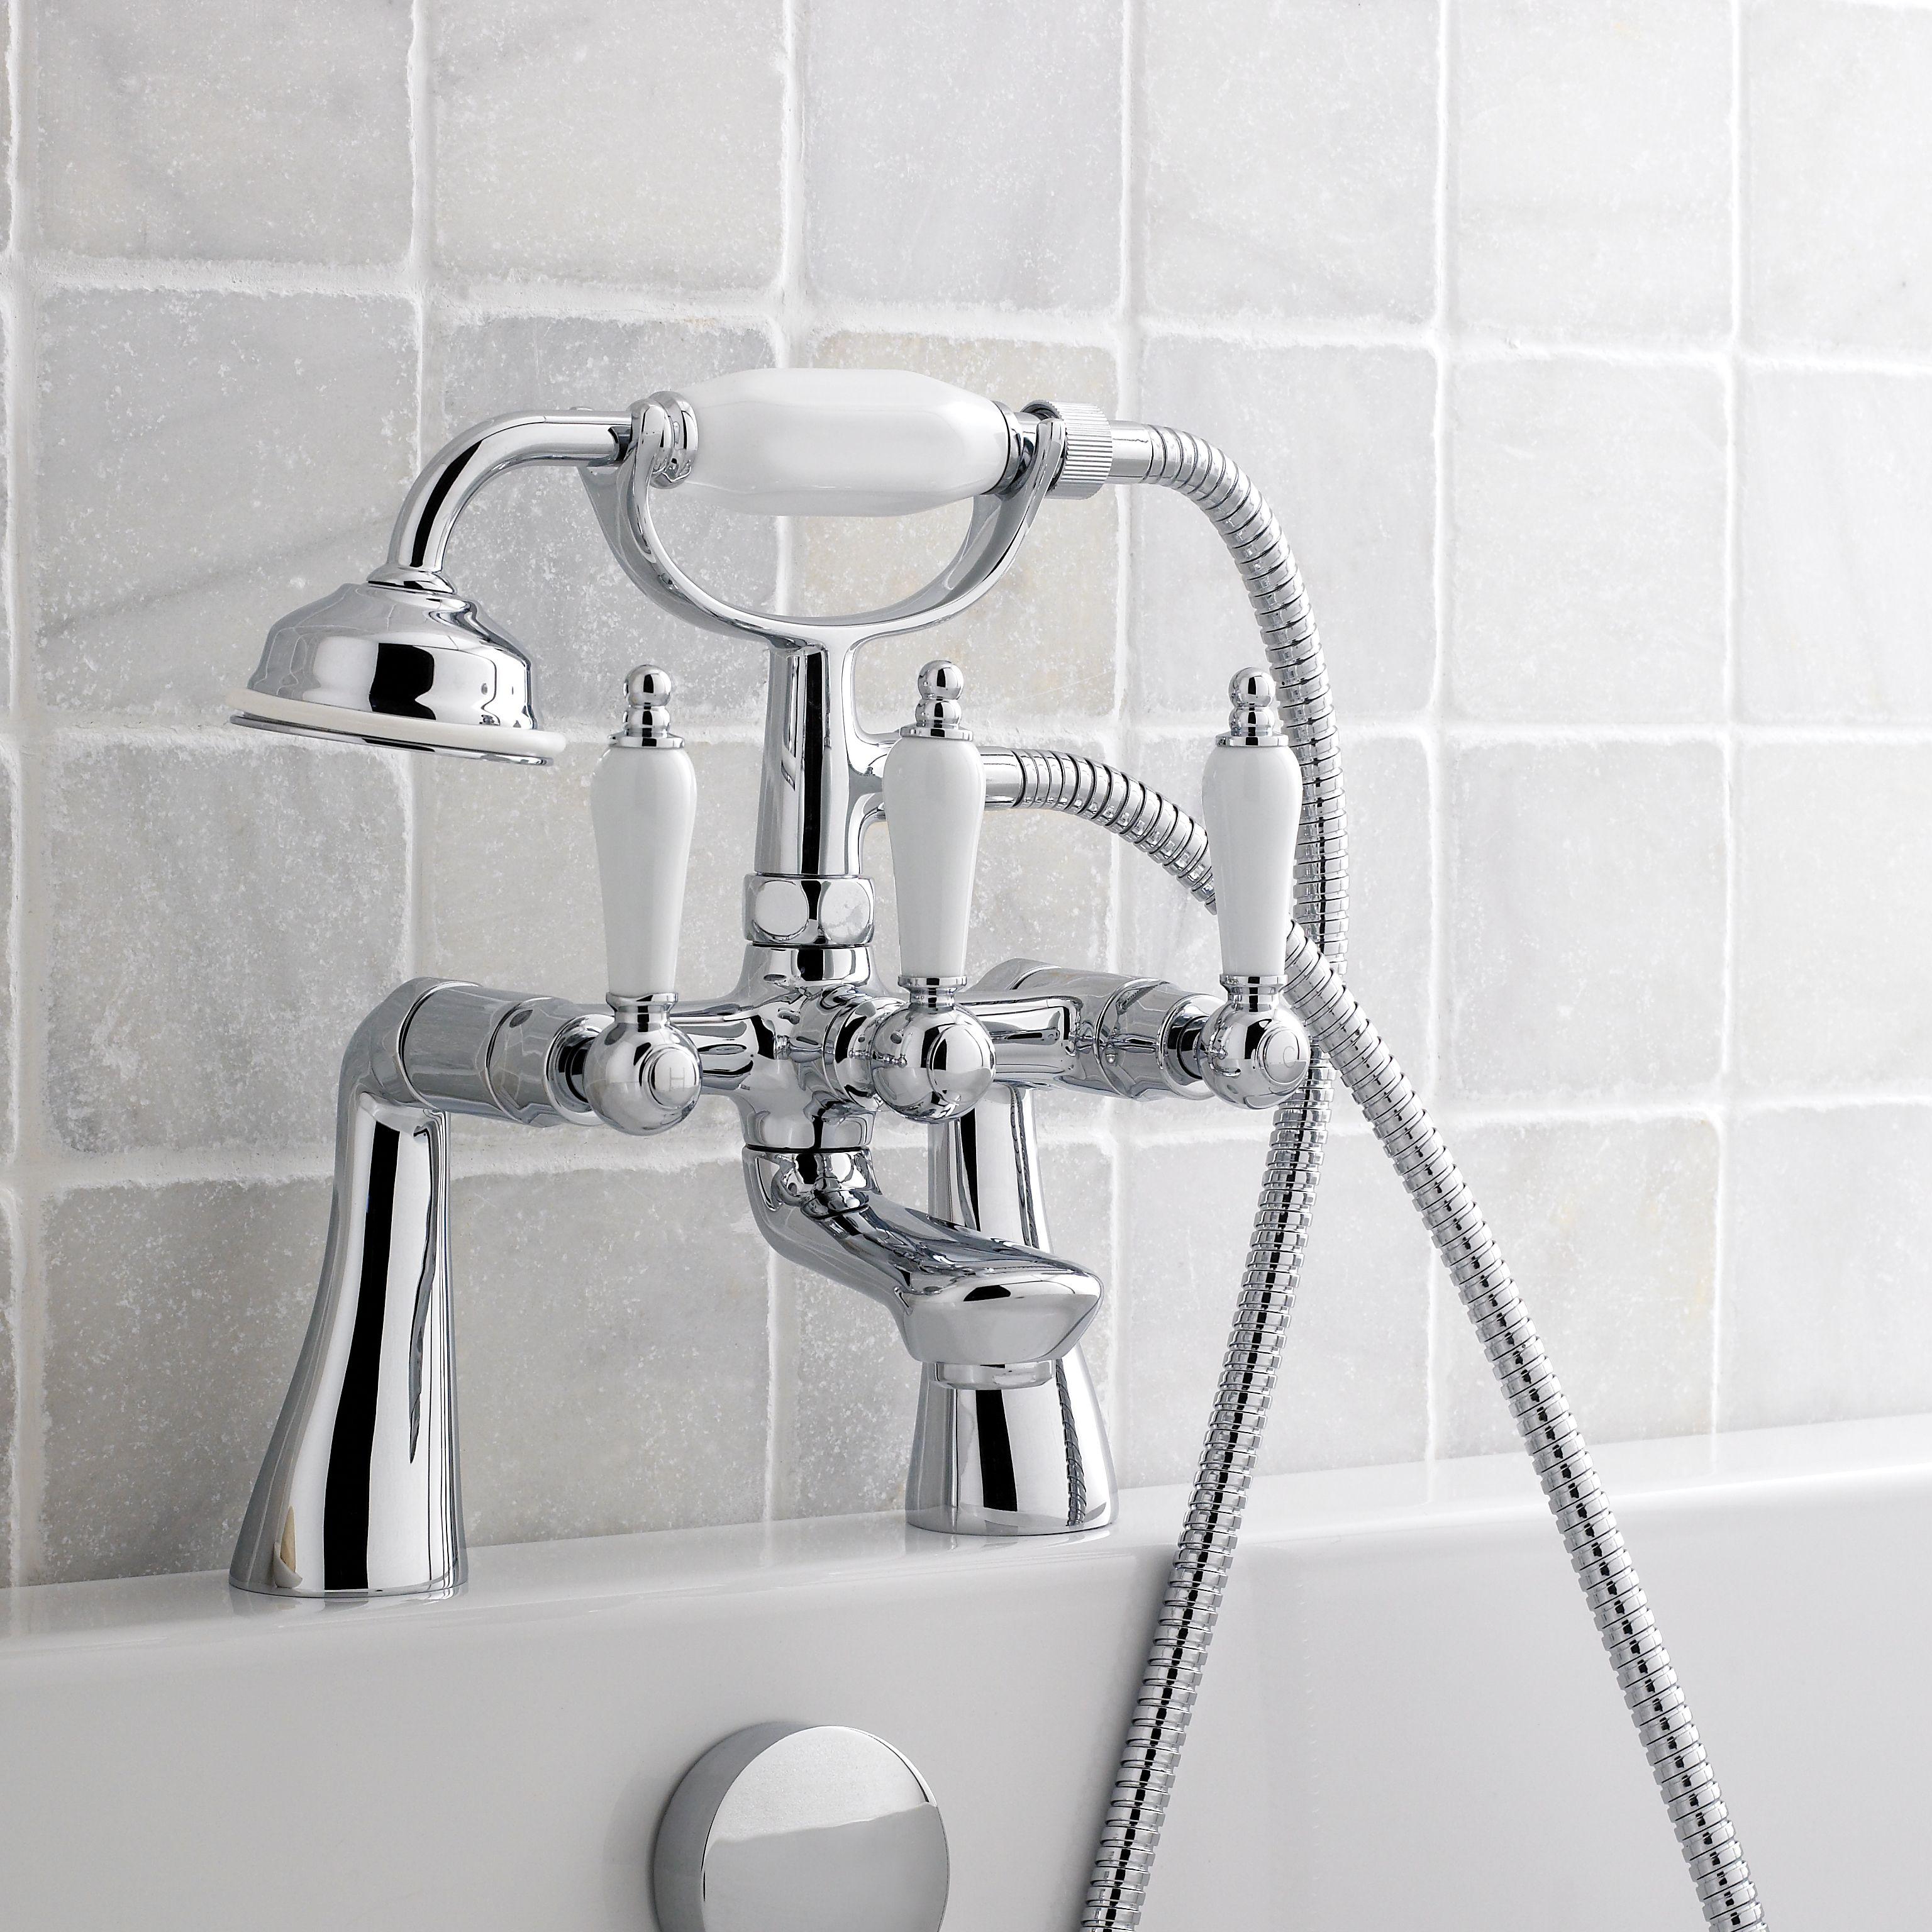 traditional bathroom taps JBGVNSL